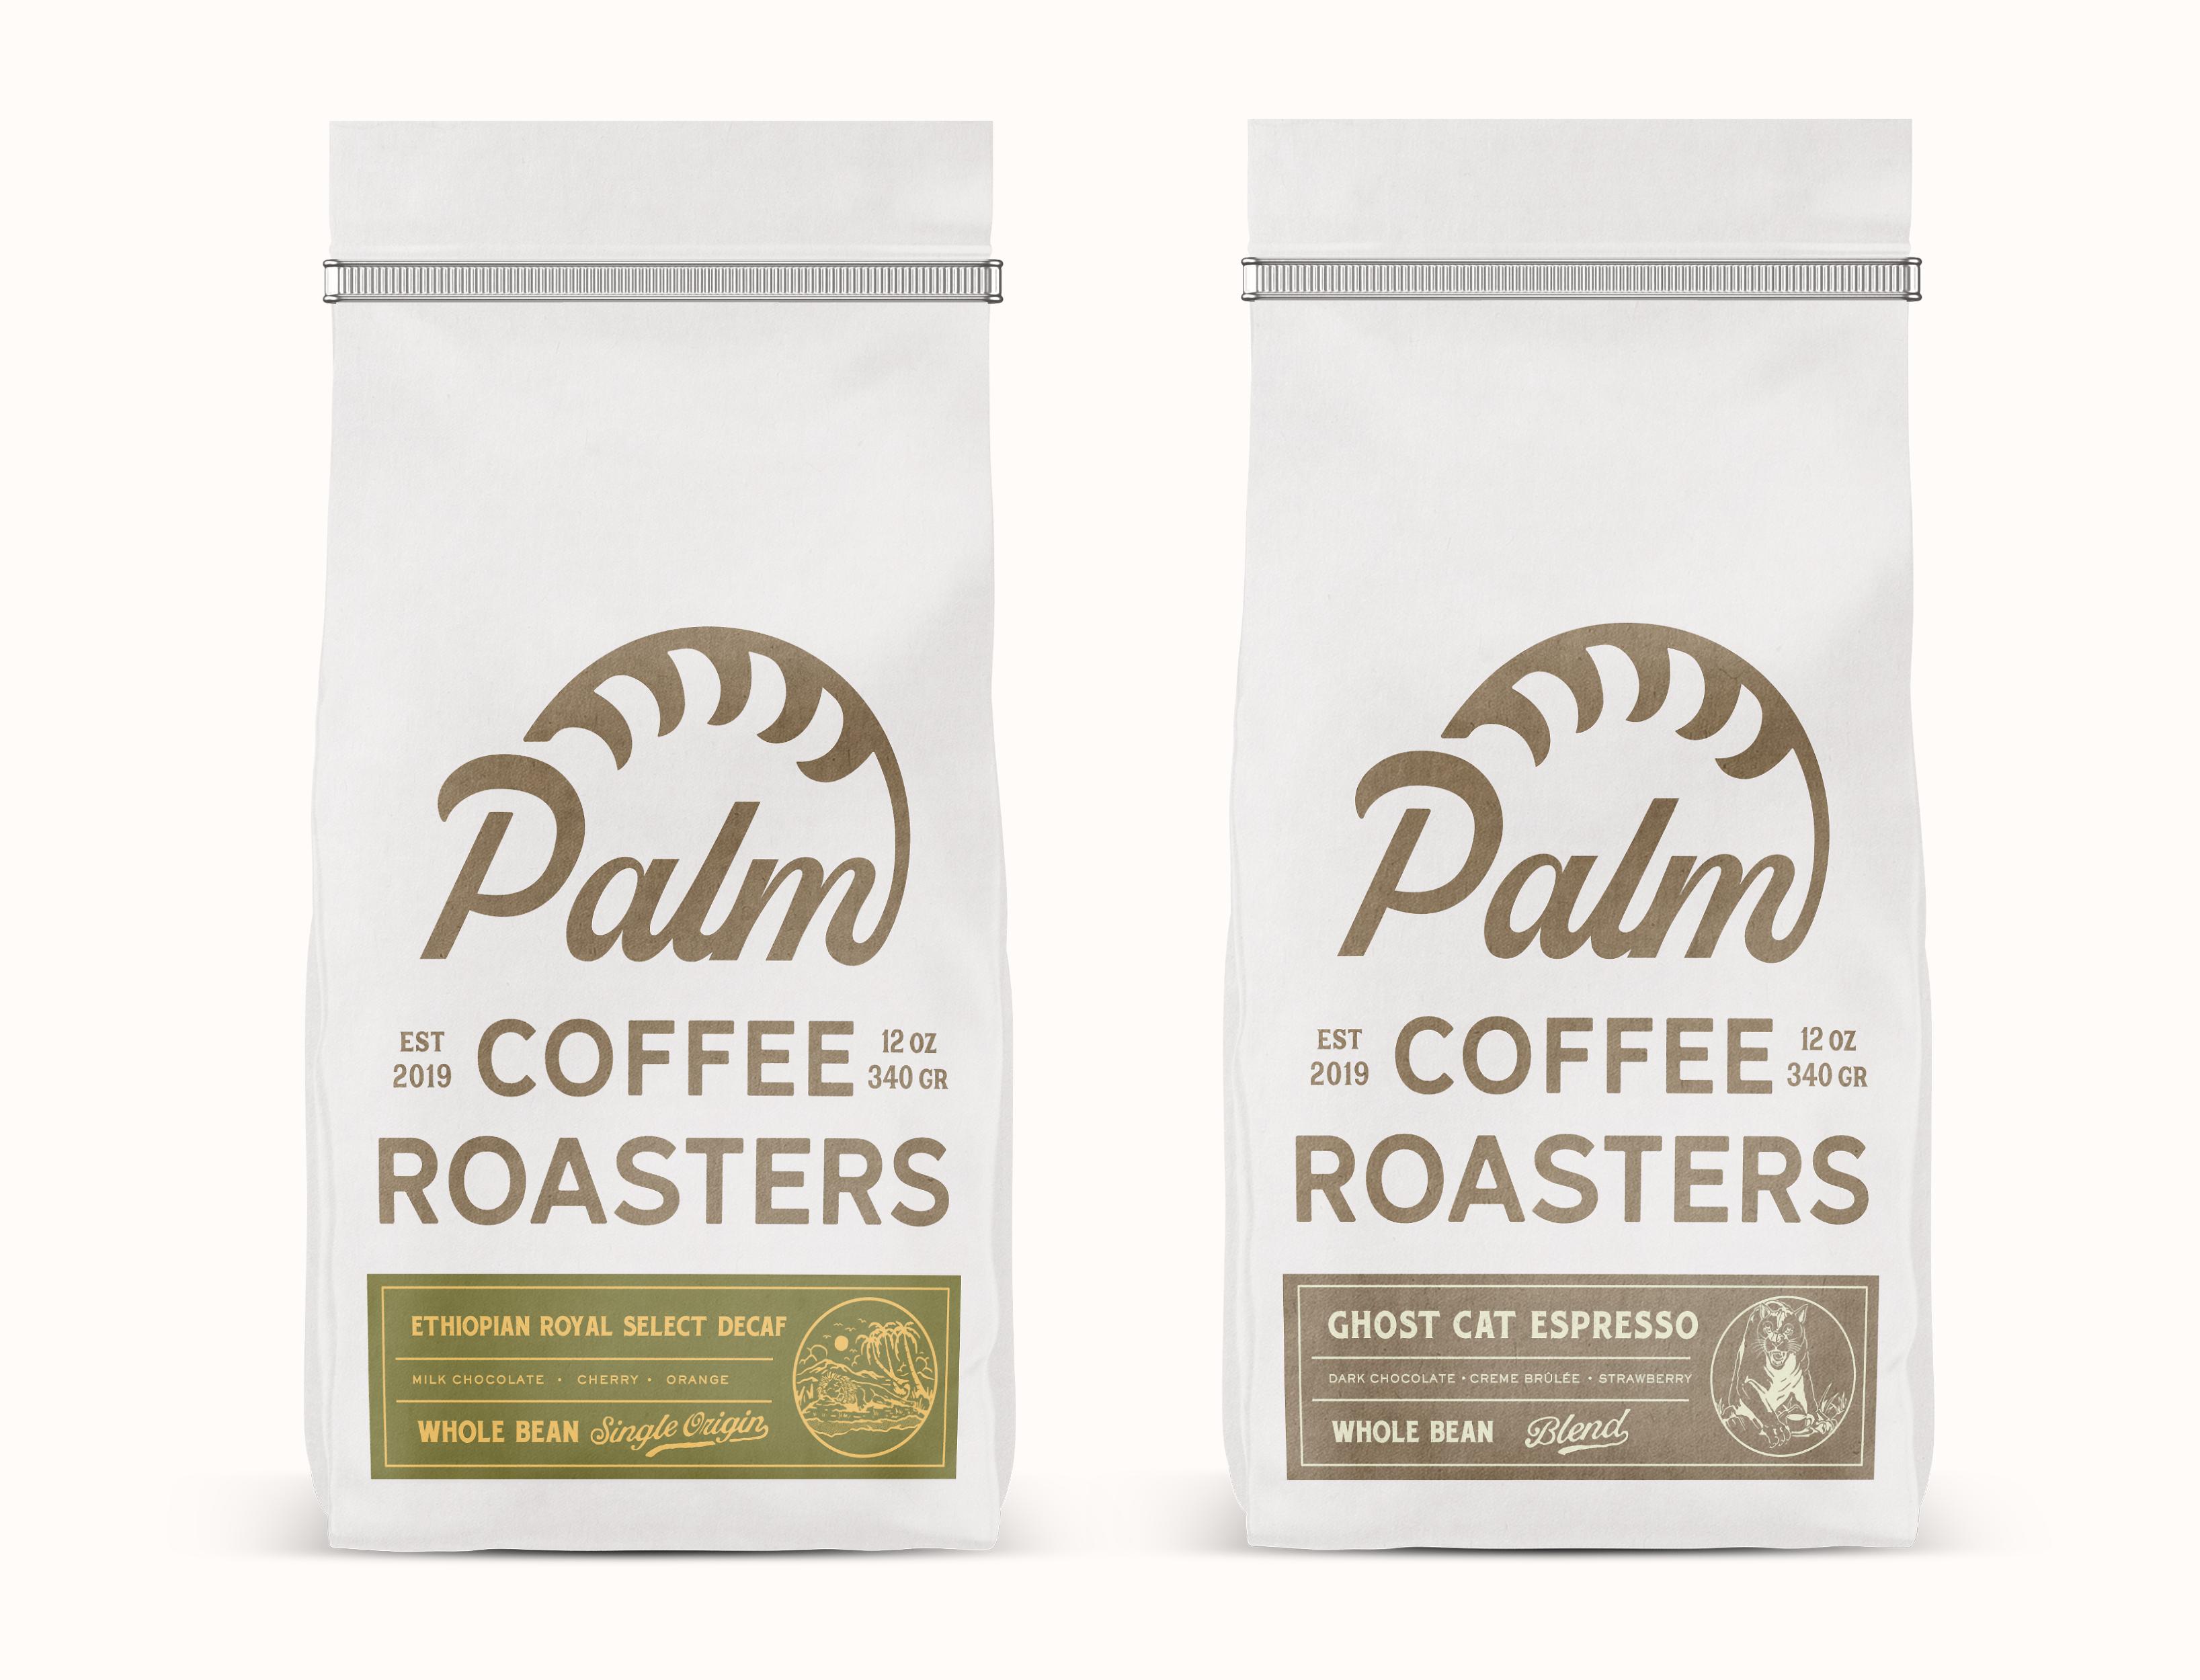 palm-branding-packaging-coffee-minimal-design-graphic-florida-hollywood-espresso-decaf-12-oz-agency-zeki-michael-freelance.jpg